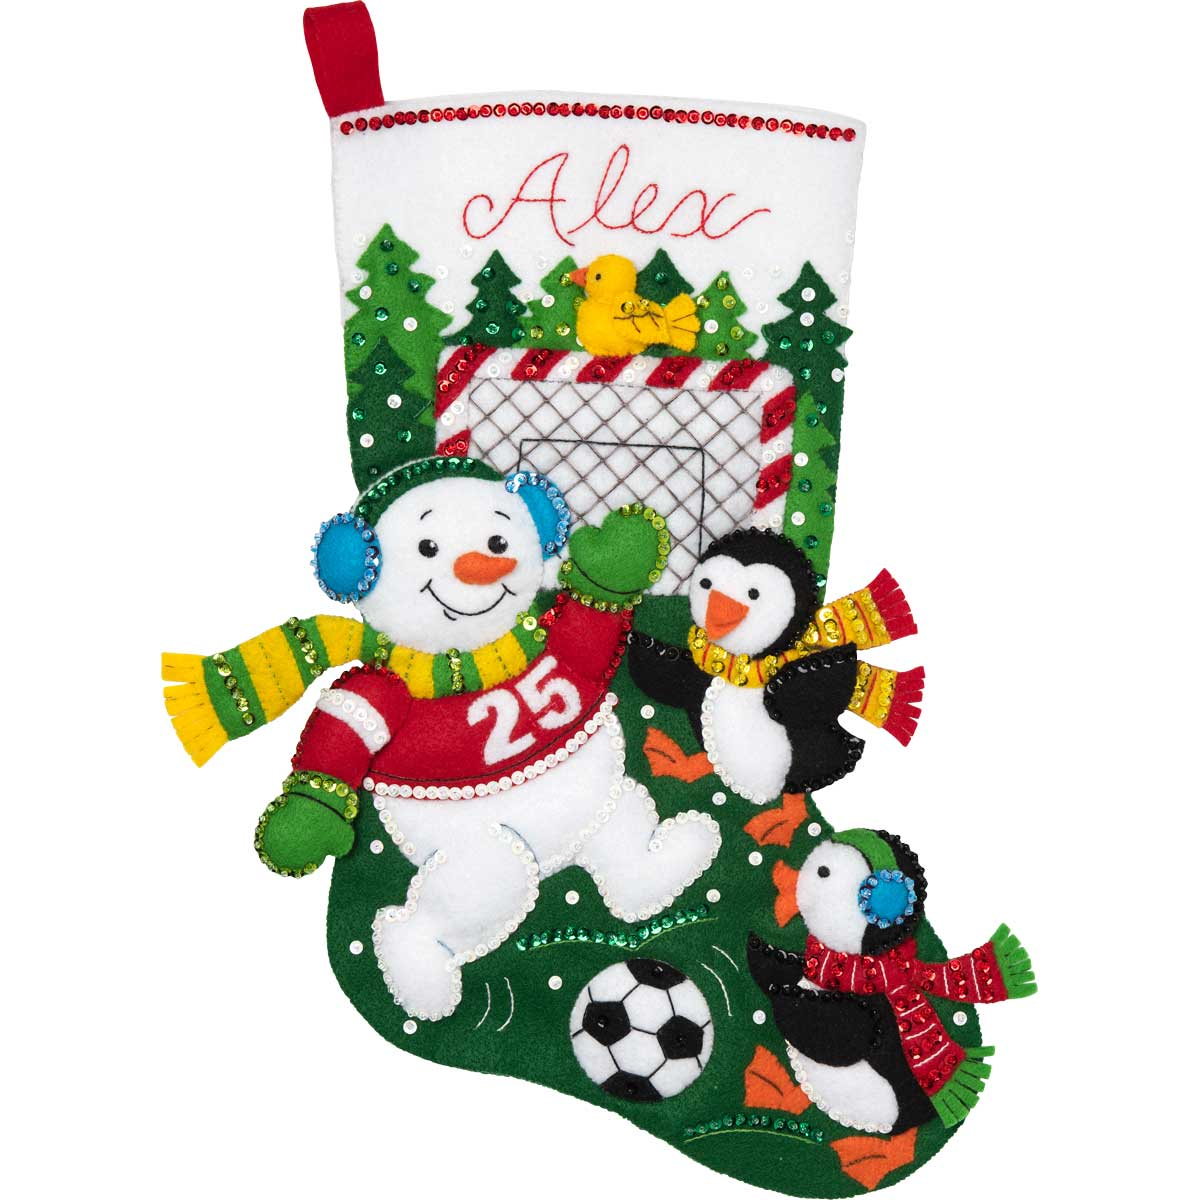 Bucilla ® Seasonal - Felt - Stocking Kits - Snowman Soccer Fan - 86904E